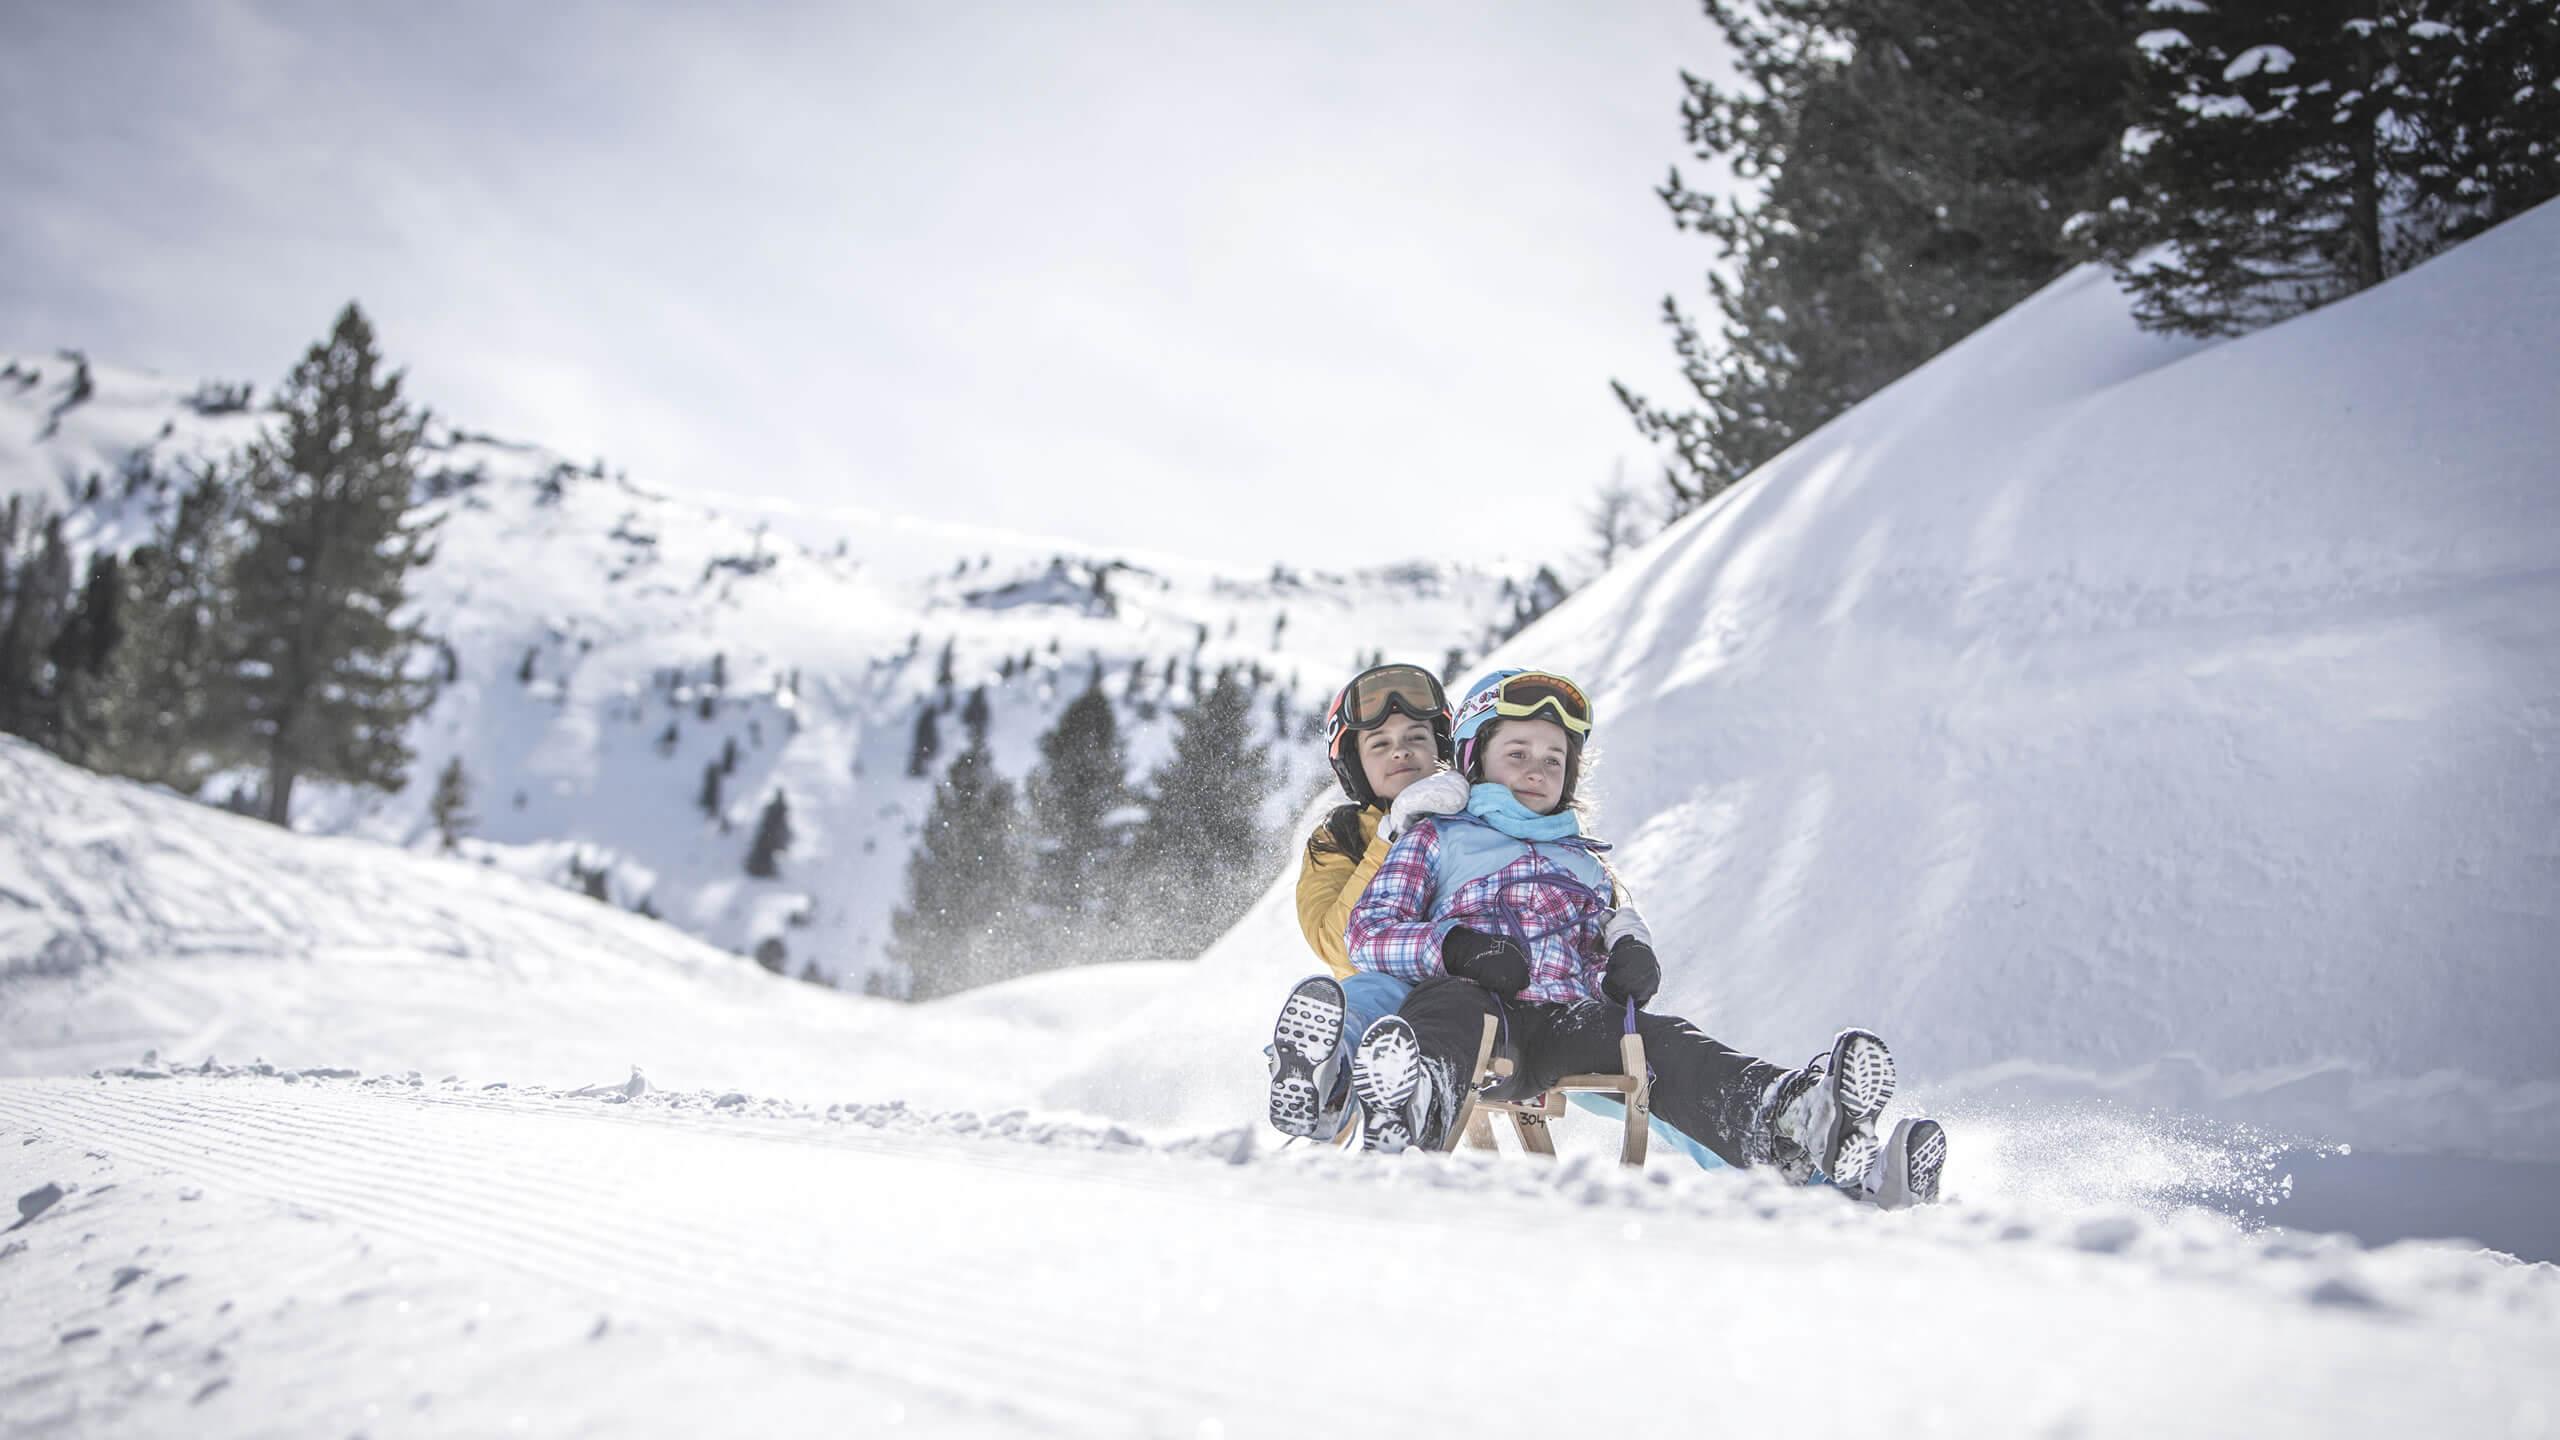 Online Shop 2019 neue Russland Winter kinder Schneeschuhe